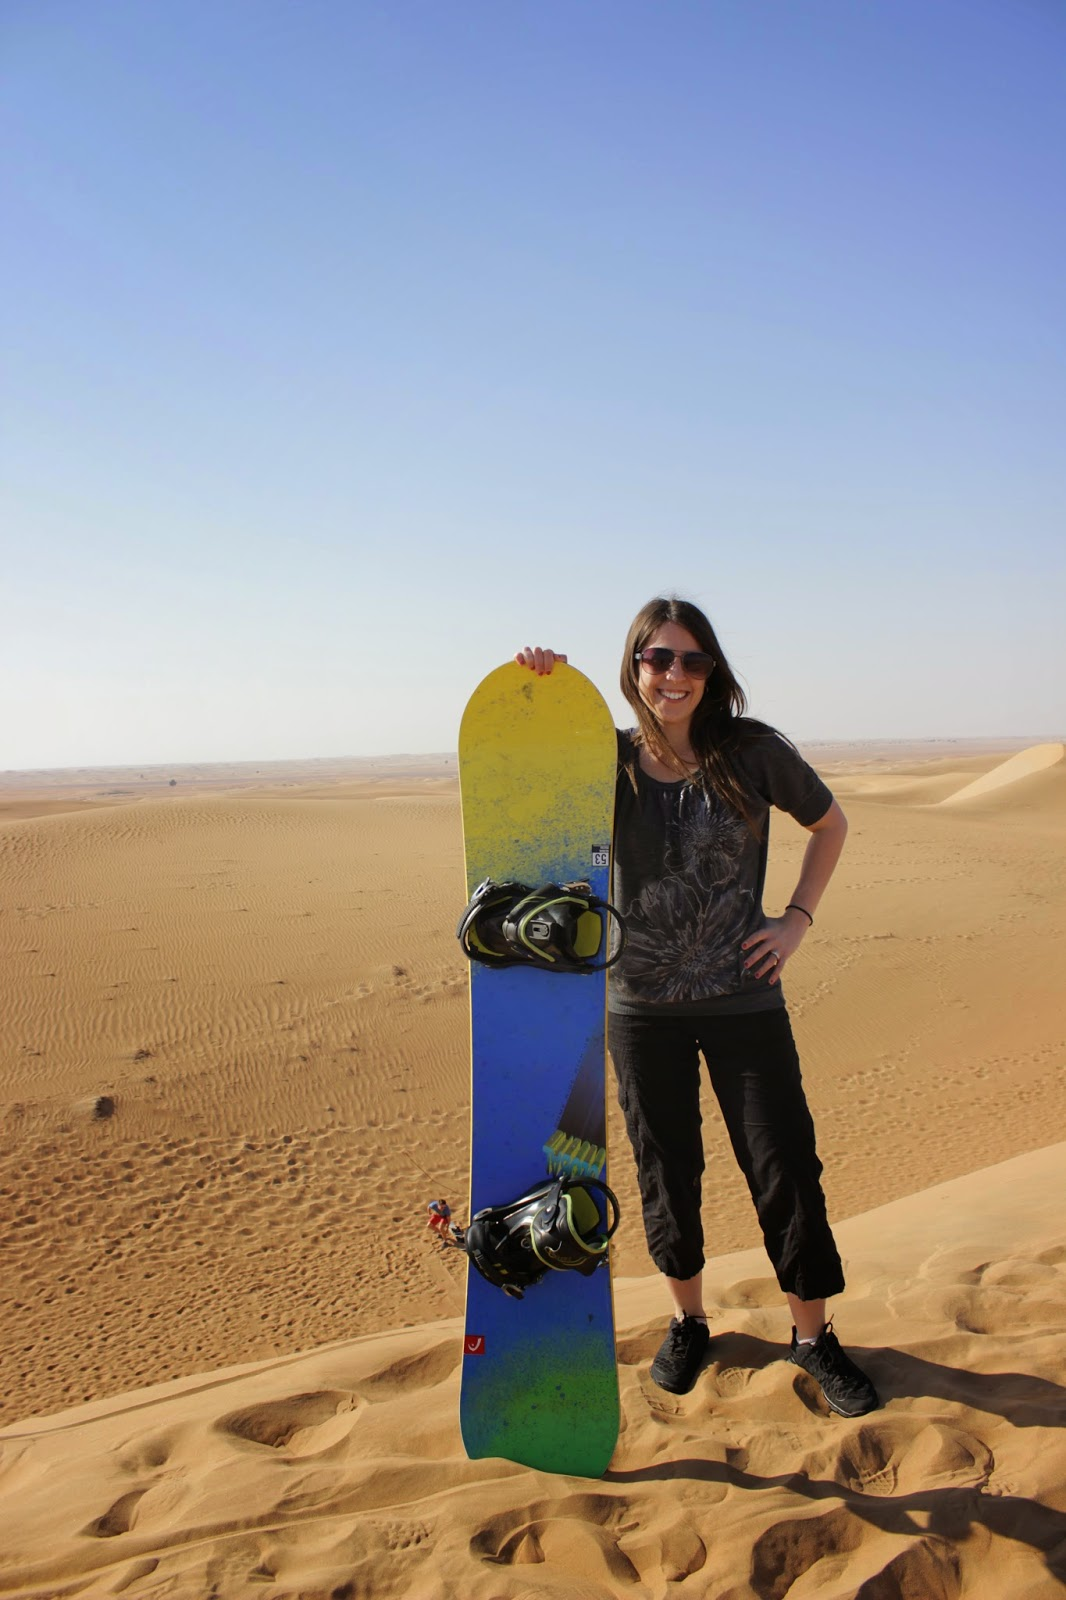 desert dune buggy adventure dubai sand boarding